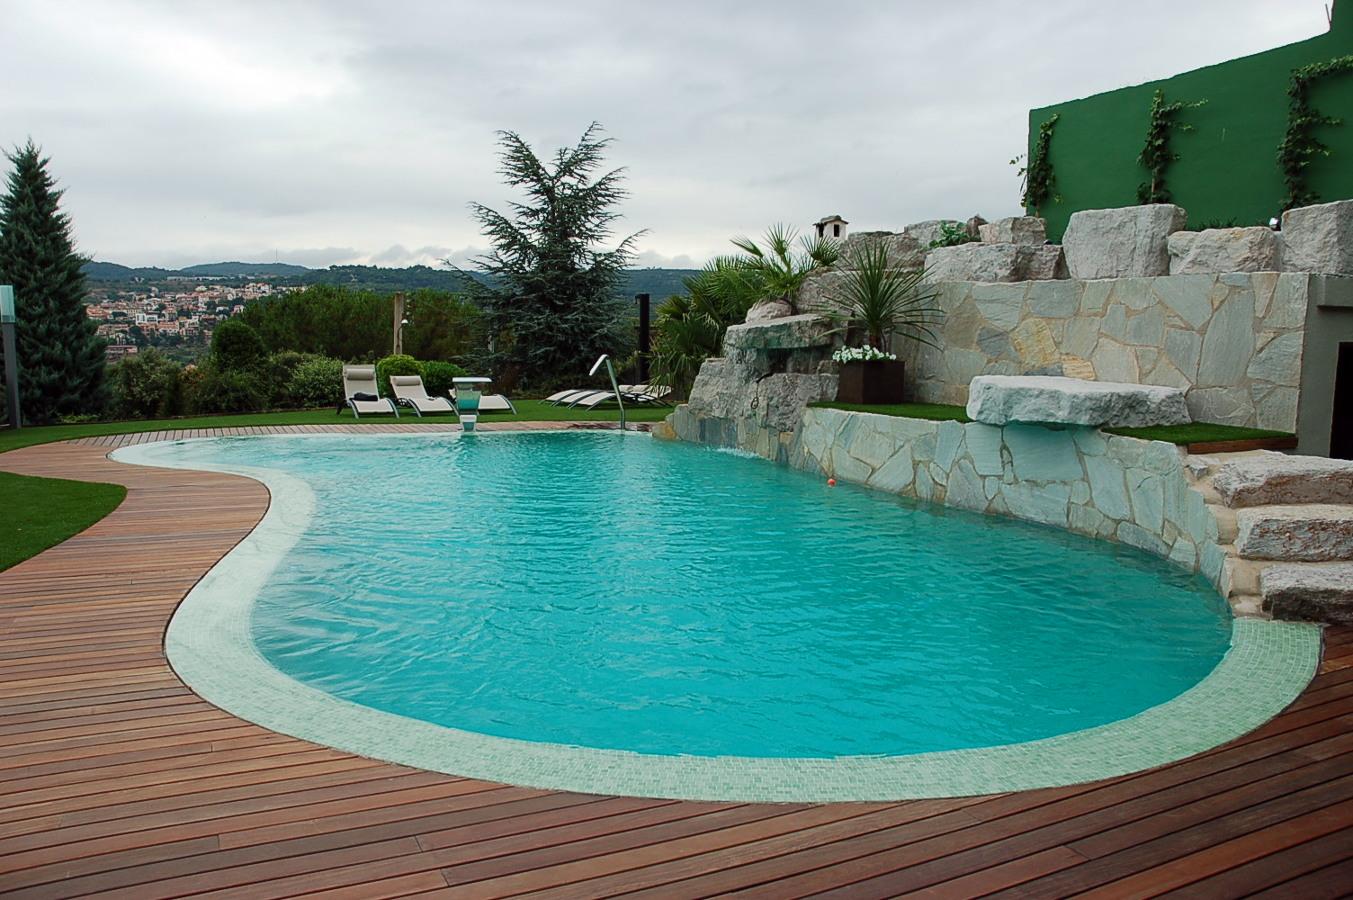 Foto piscina desbordant de piscines munt 251103 for Piscina caldes de montbui